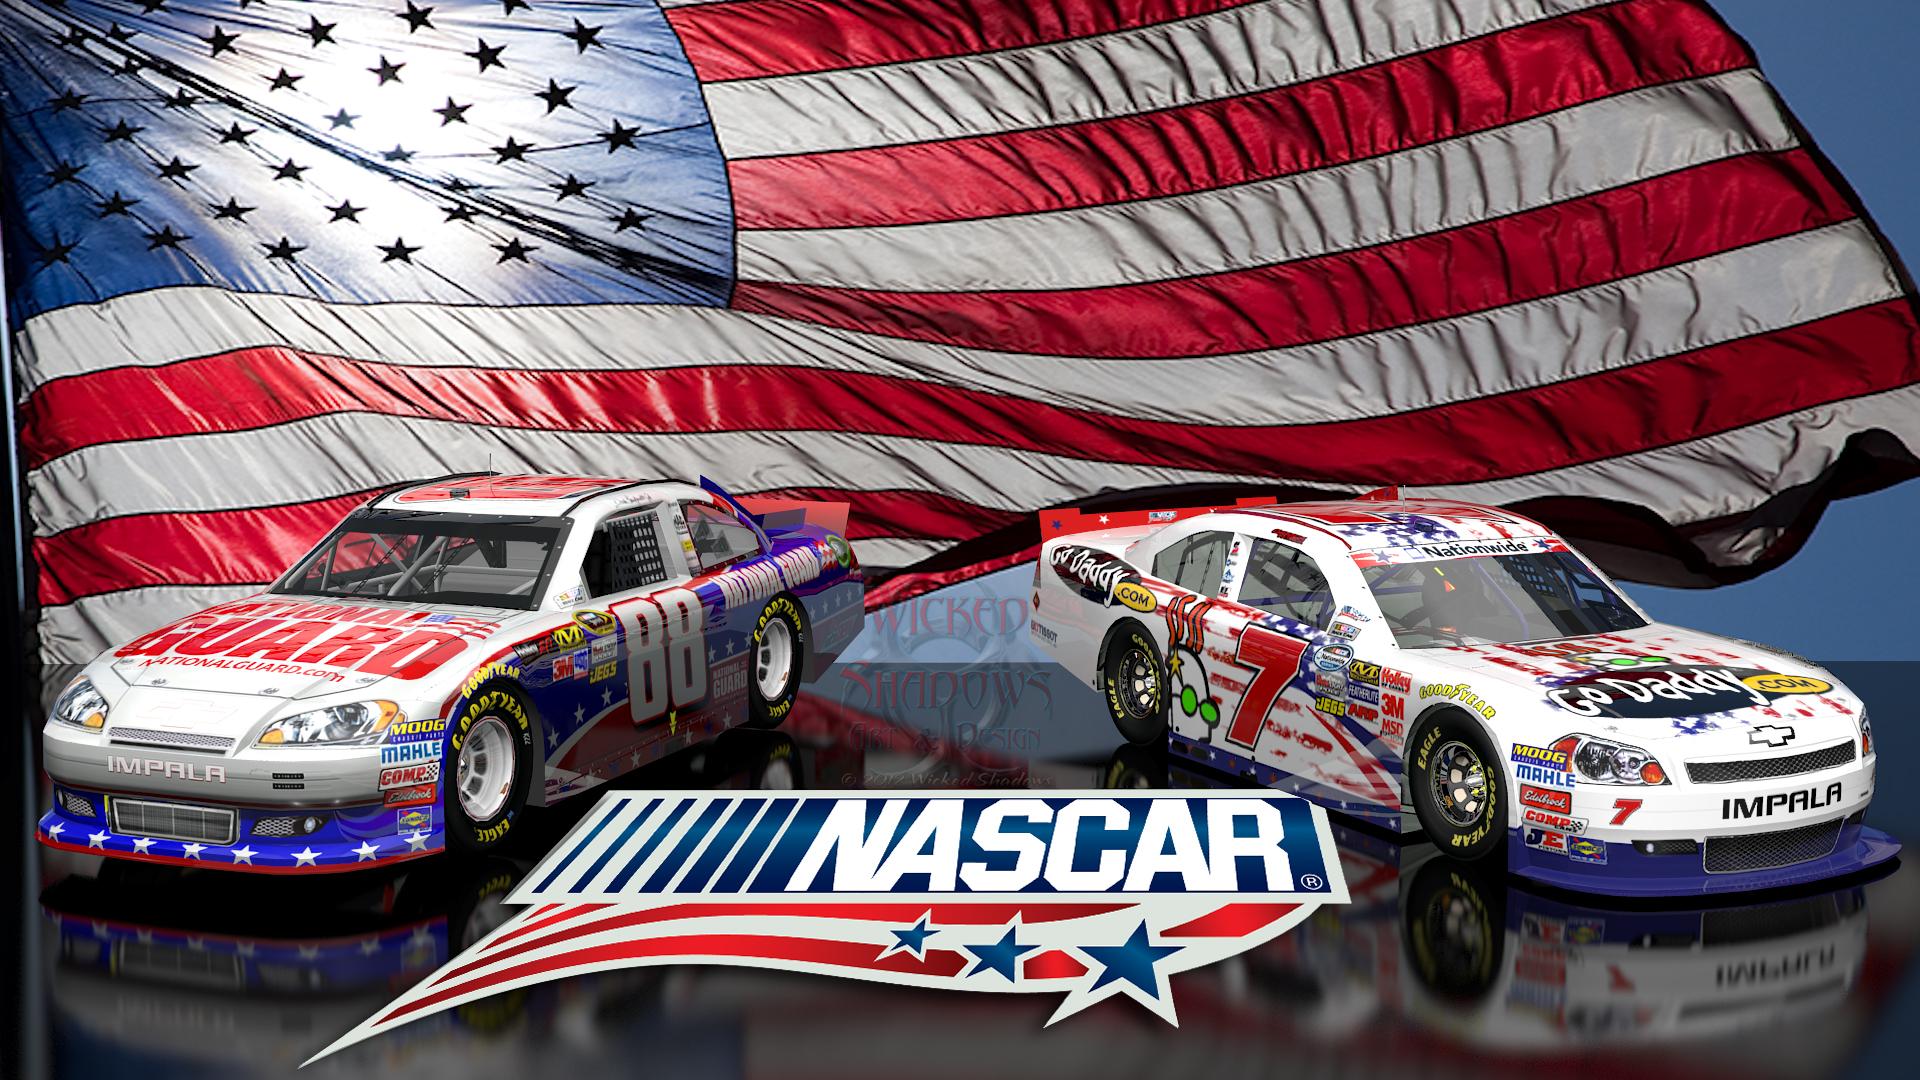 Danica Patrick Dale Earnhardt Jr NASCAR Unites wallpaper 16x9